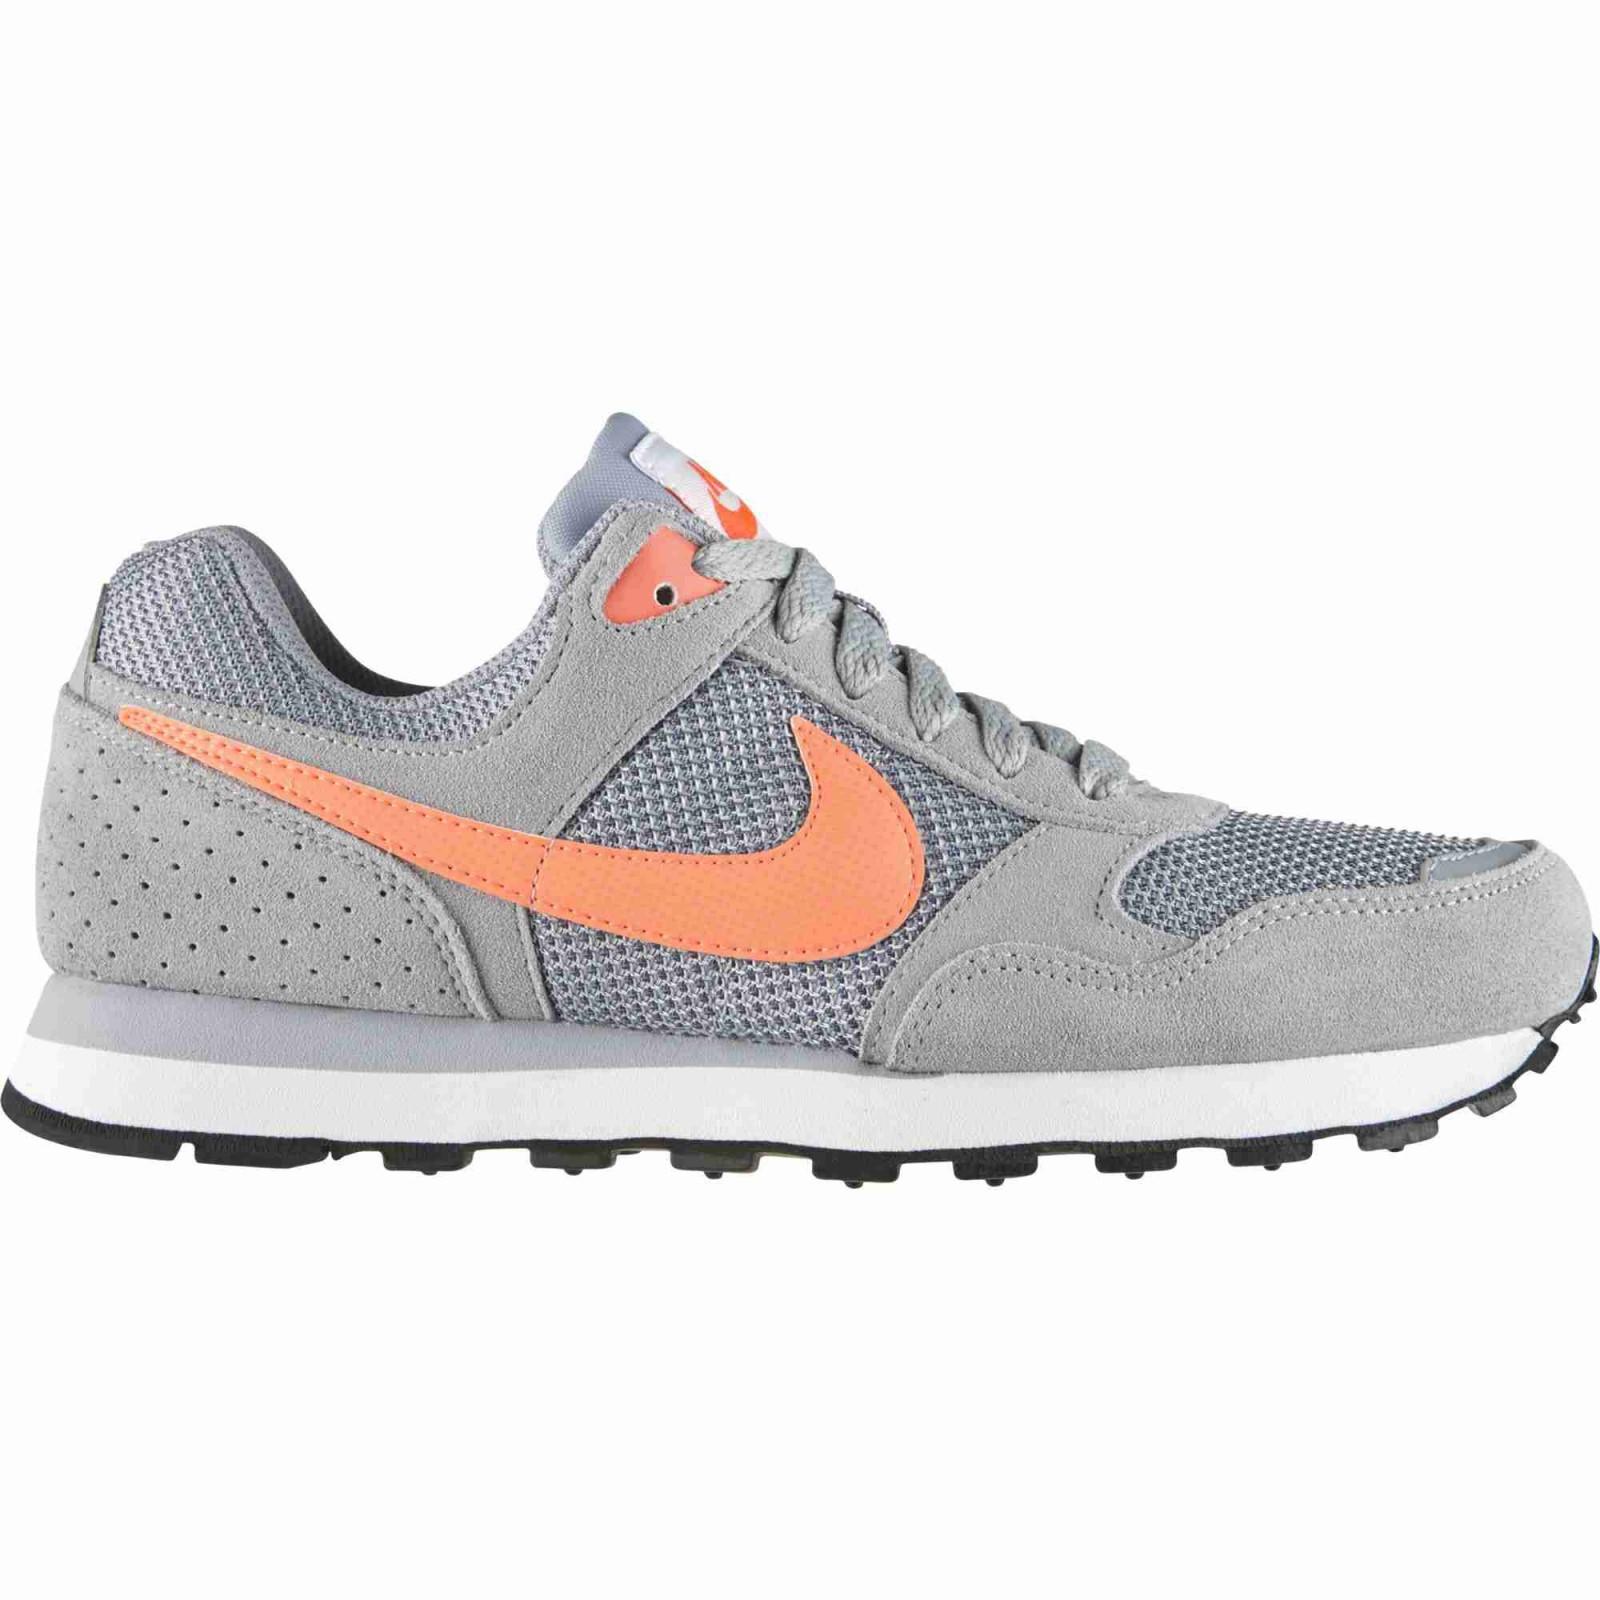 4da0cf0089b Dámské boty Nike WMNS MD RUNNER